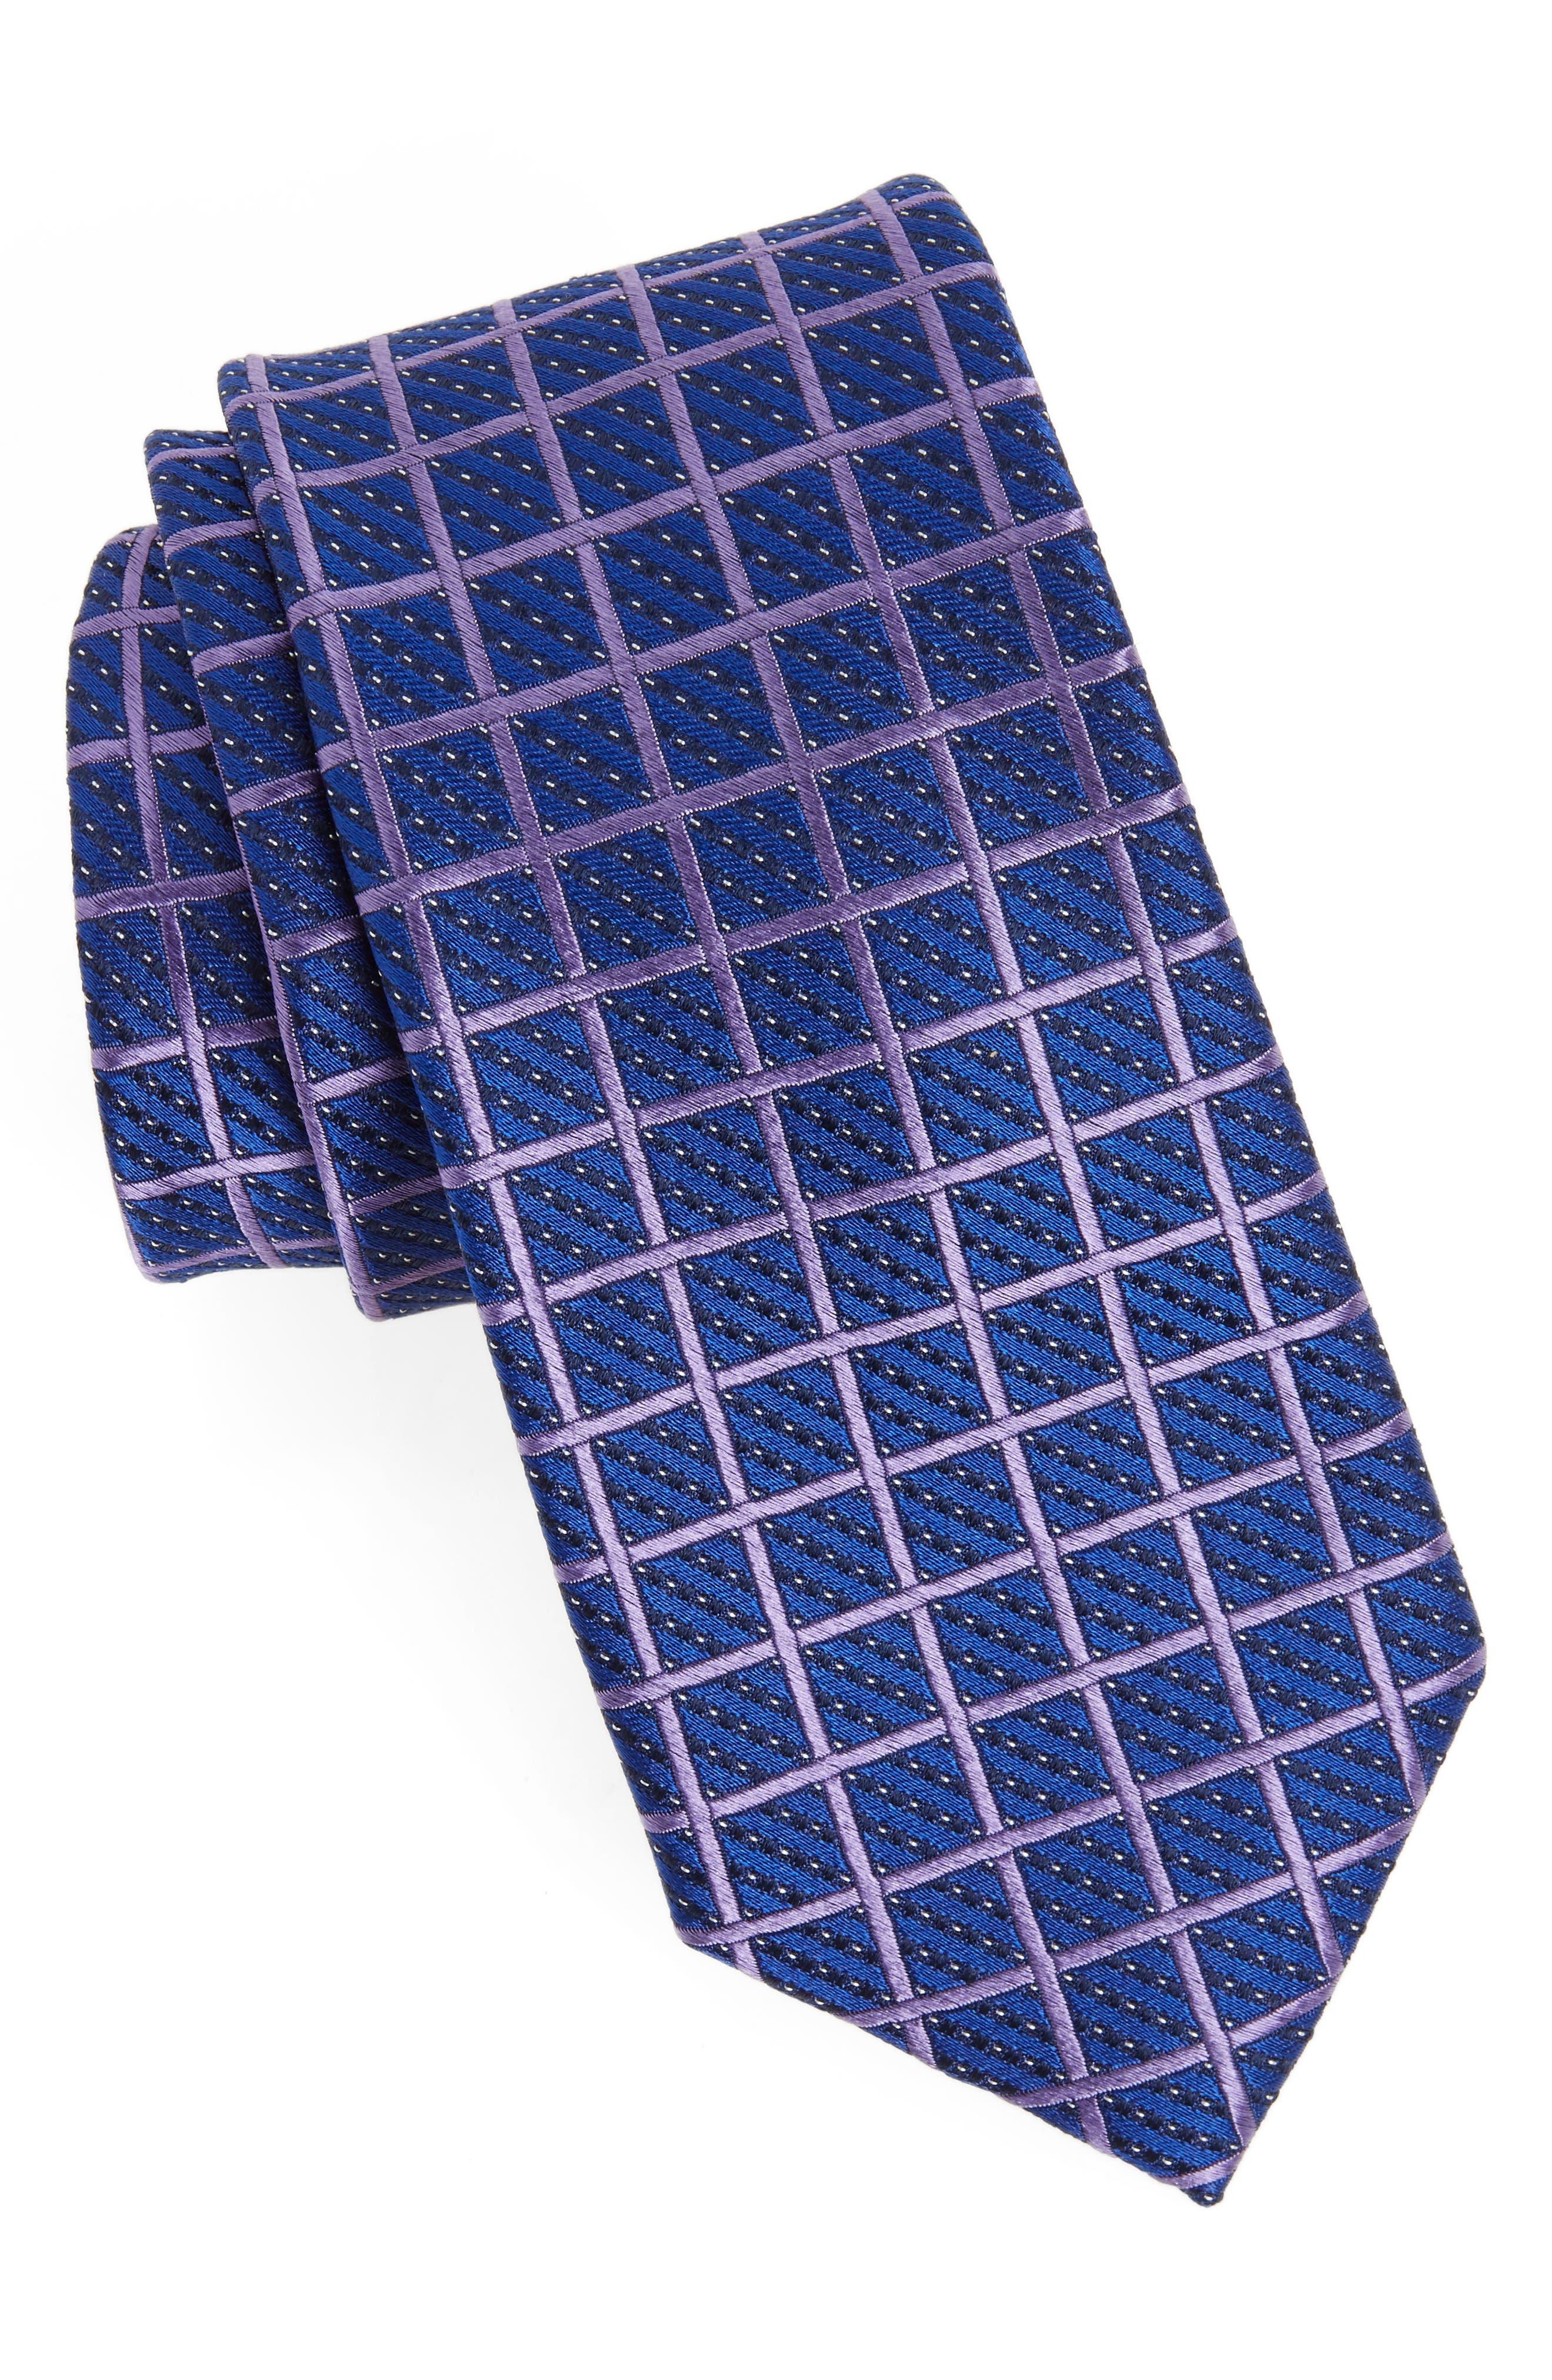 Nordstrom Tattersall Silk Tie